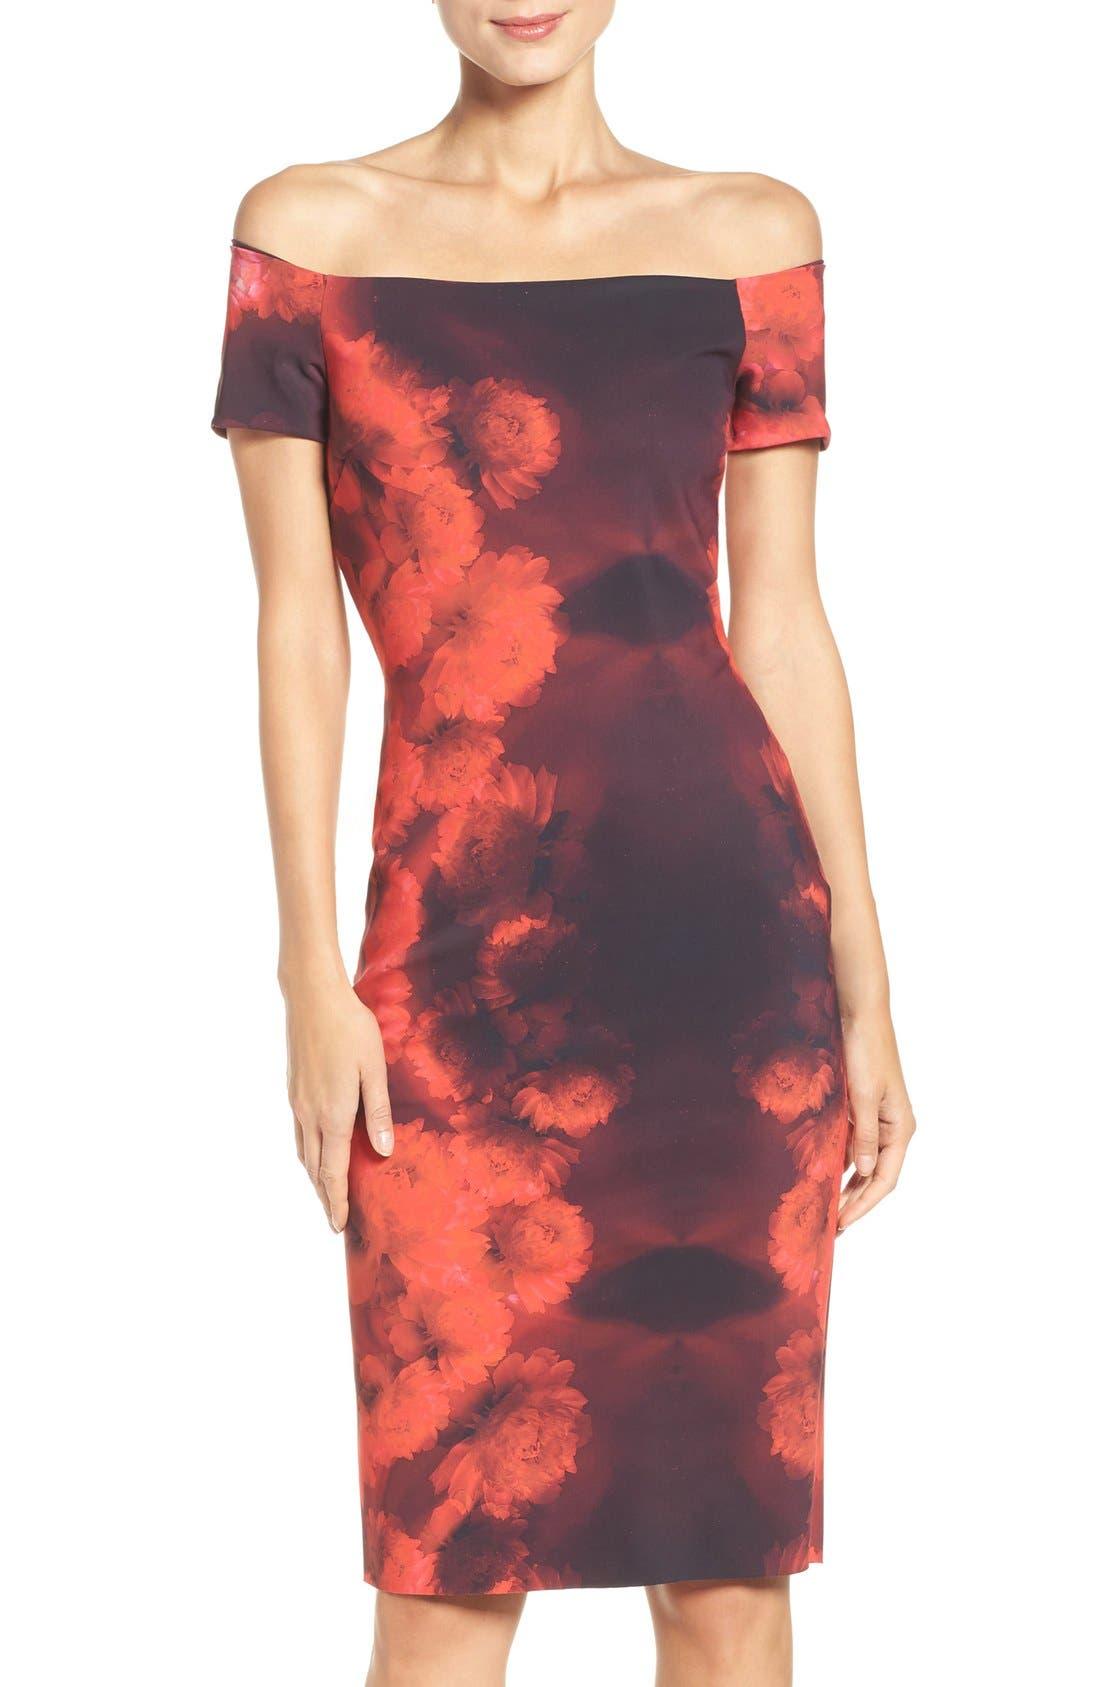 Alternate Image 1 Selected - Chiara Boni La Petite Robe Lyris Print Sheath Dress